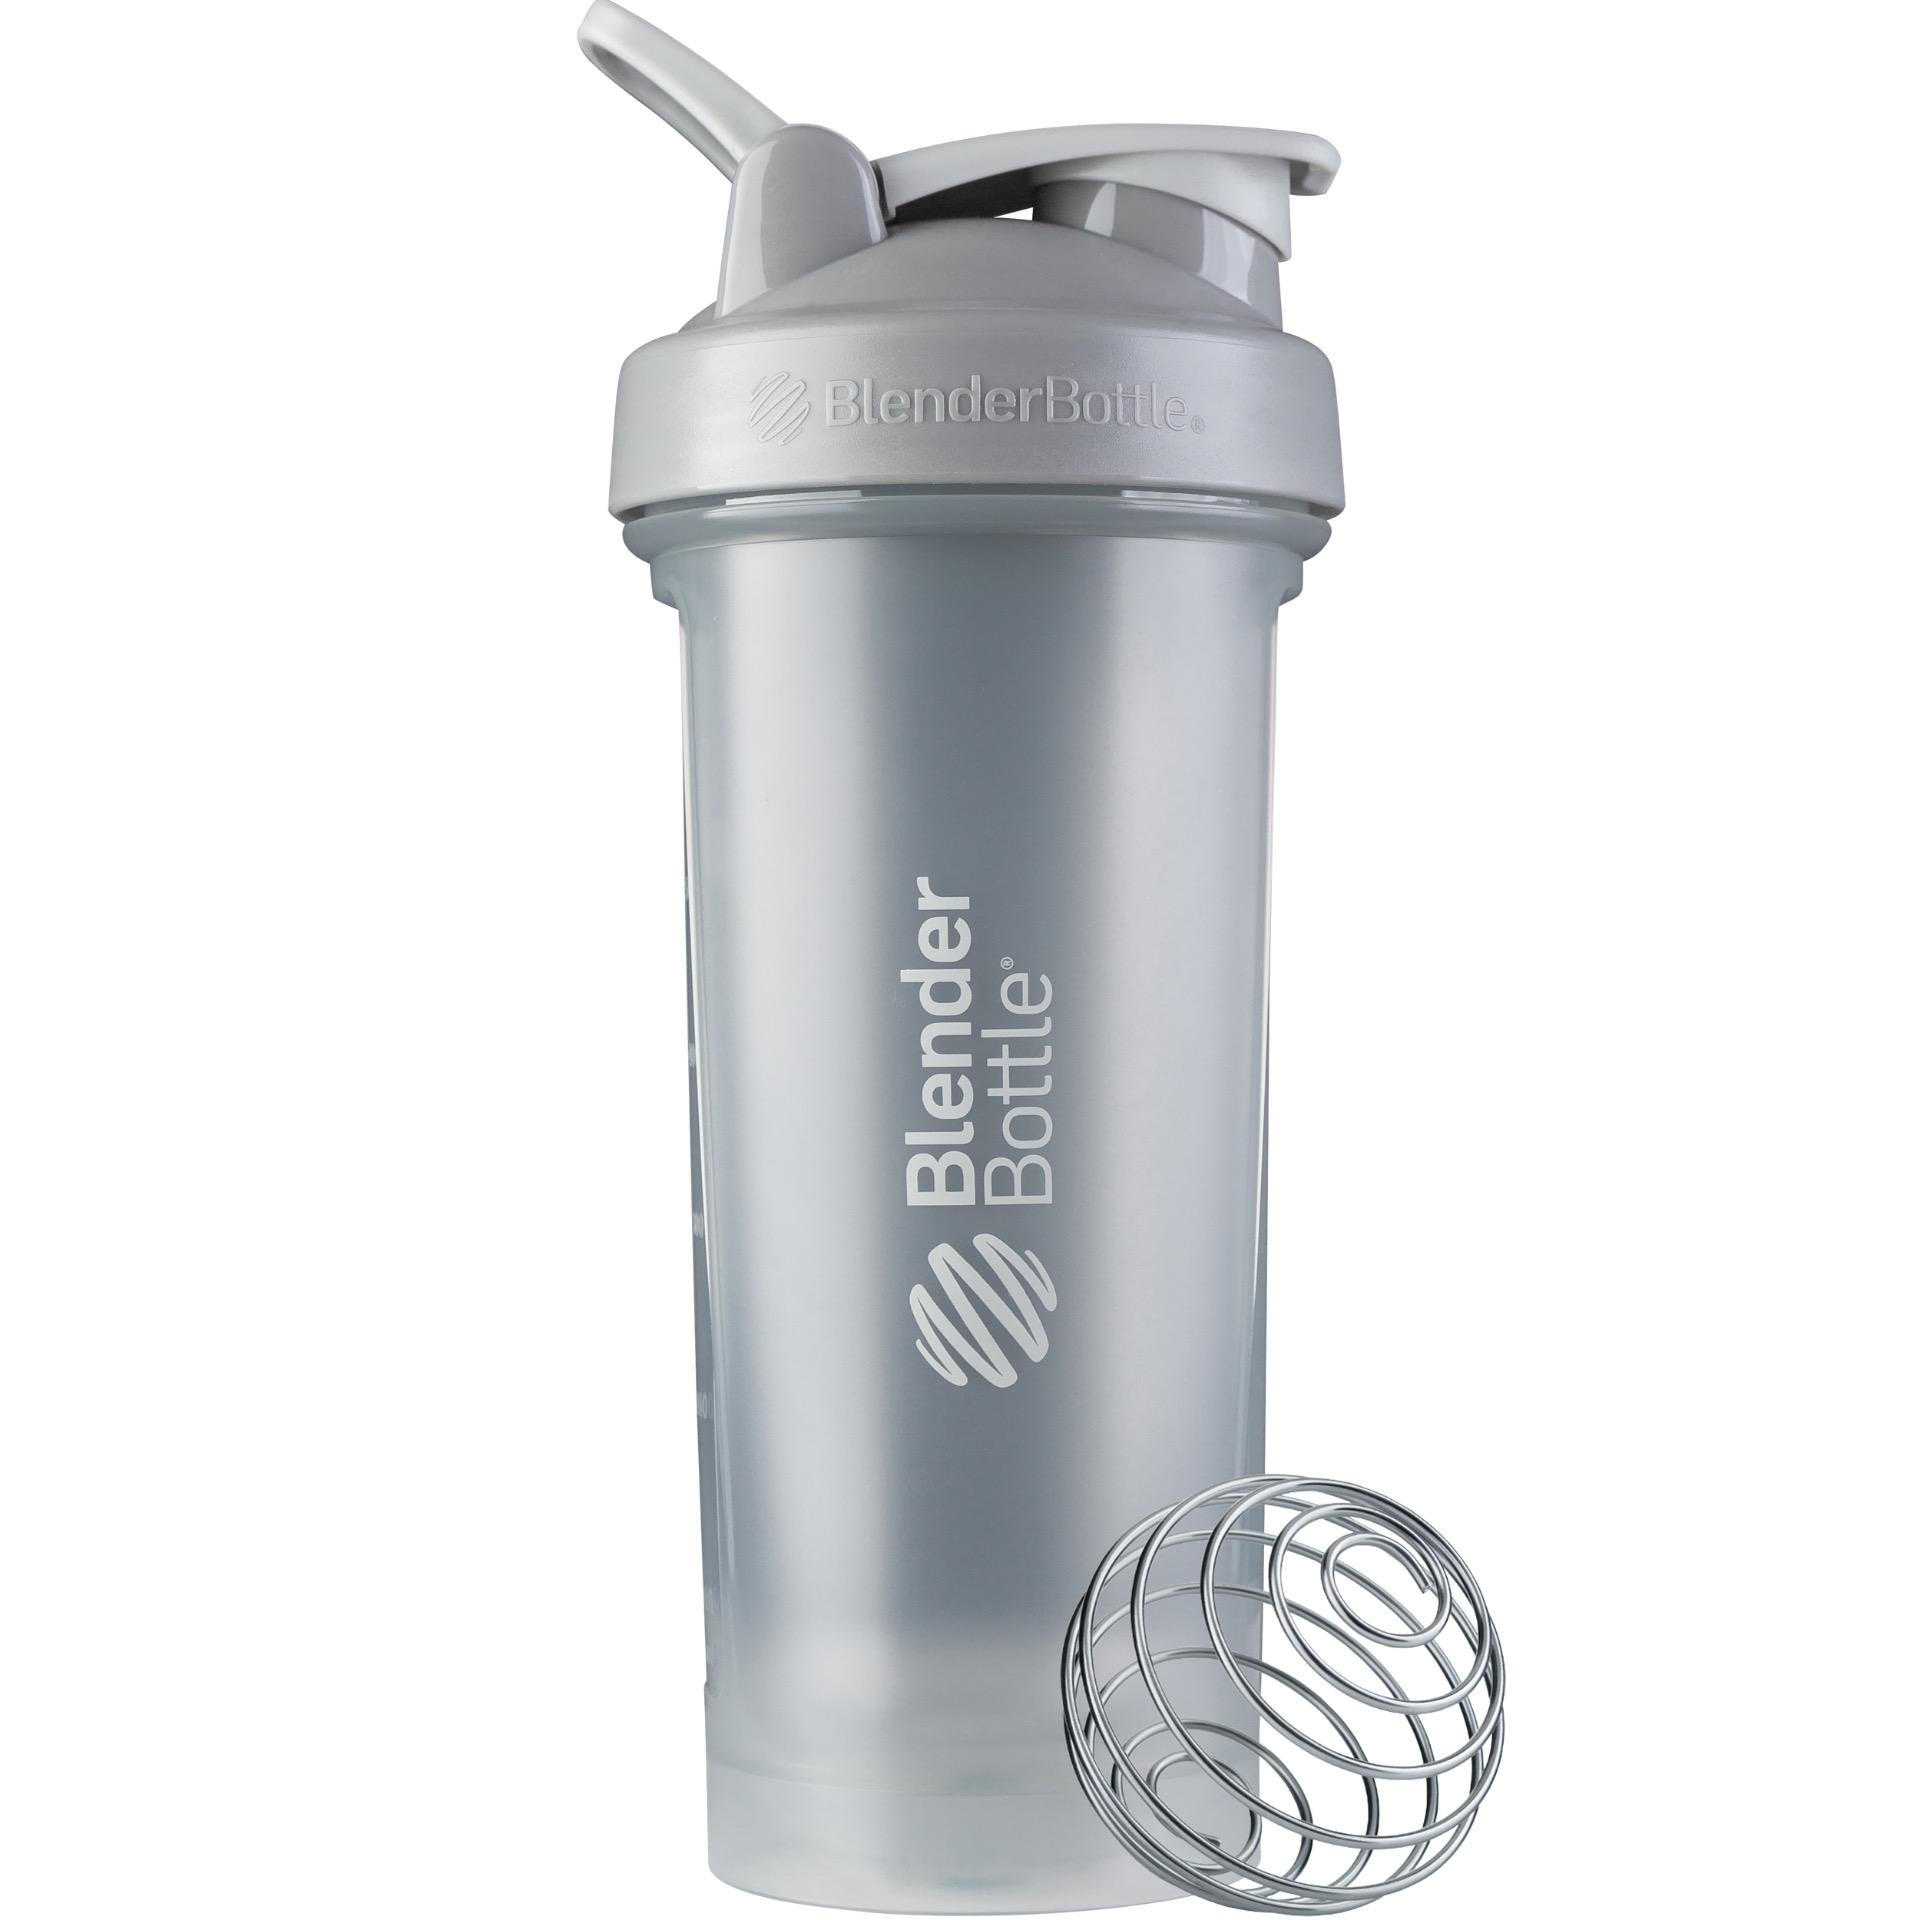 [Blender Bottle] 第2代Classic搖搖杯(830ml/28oz)-太空灰